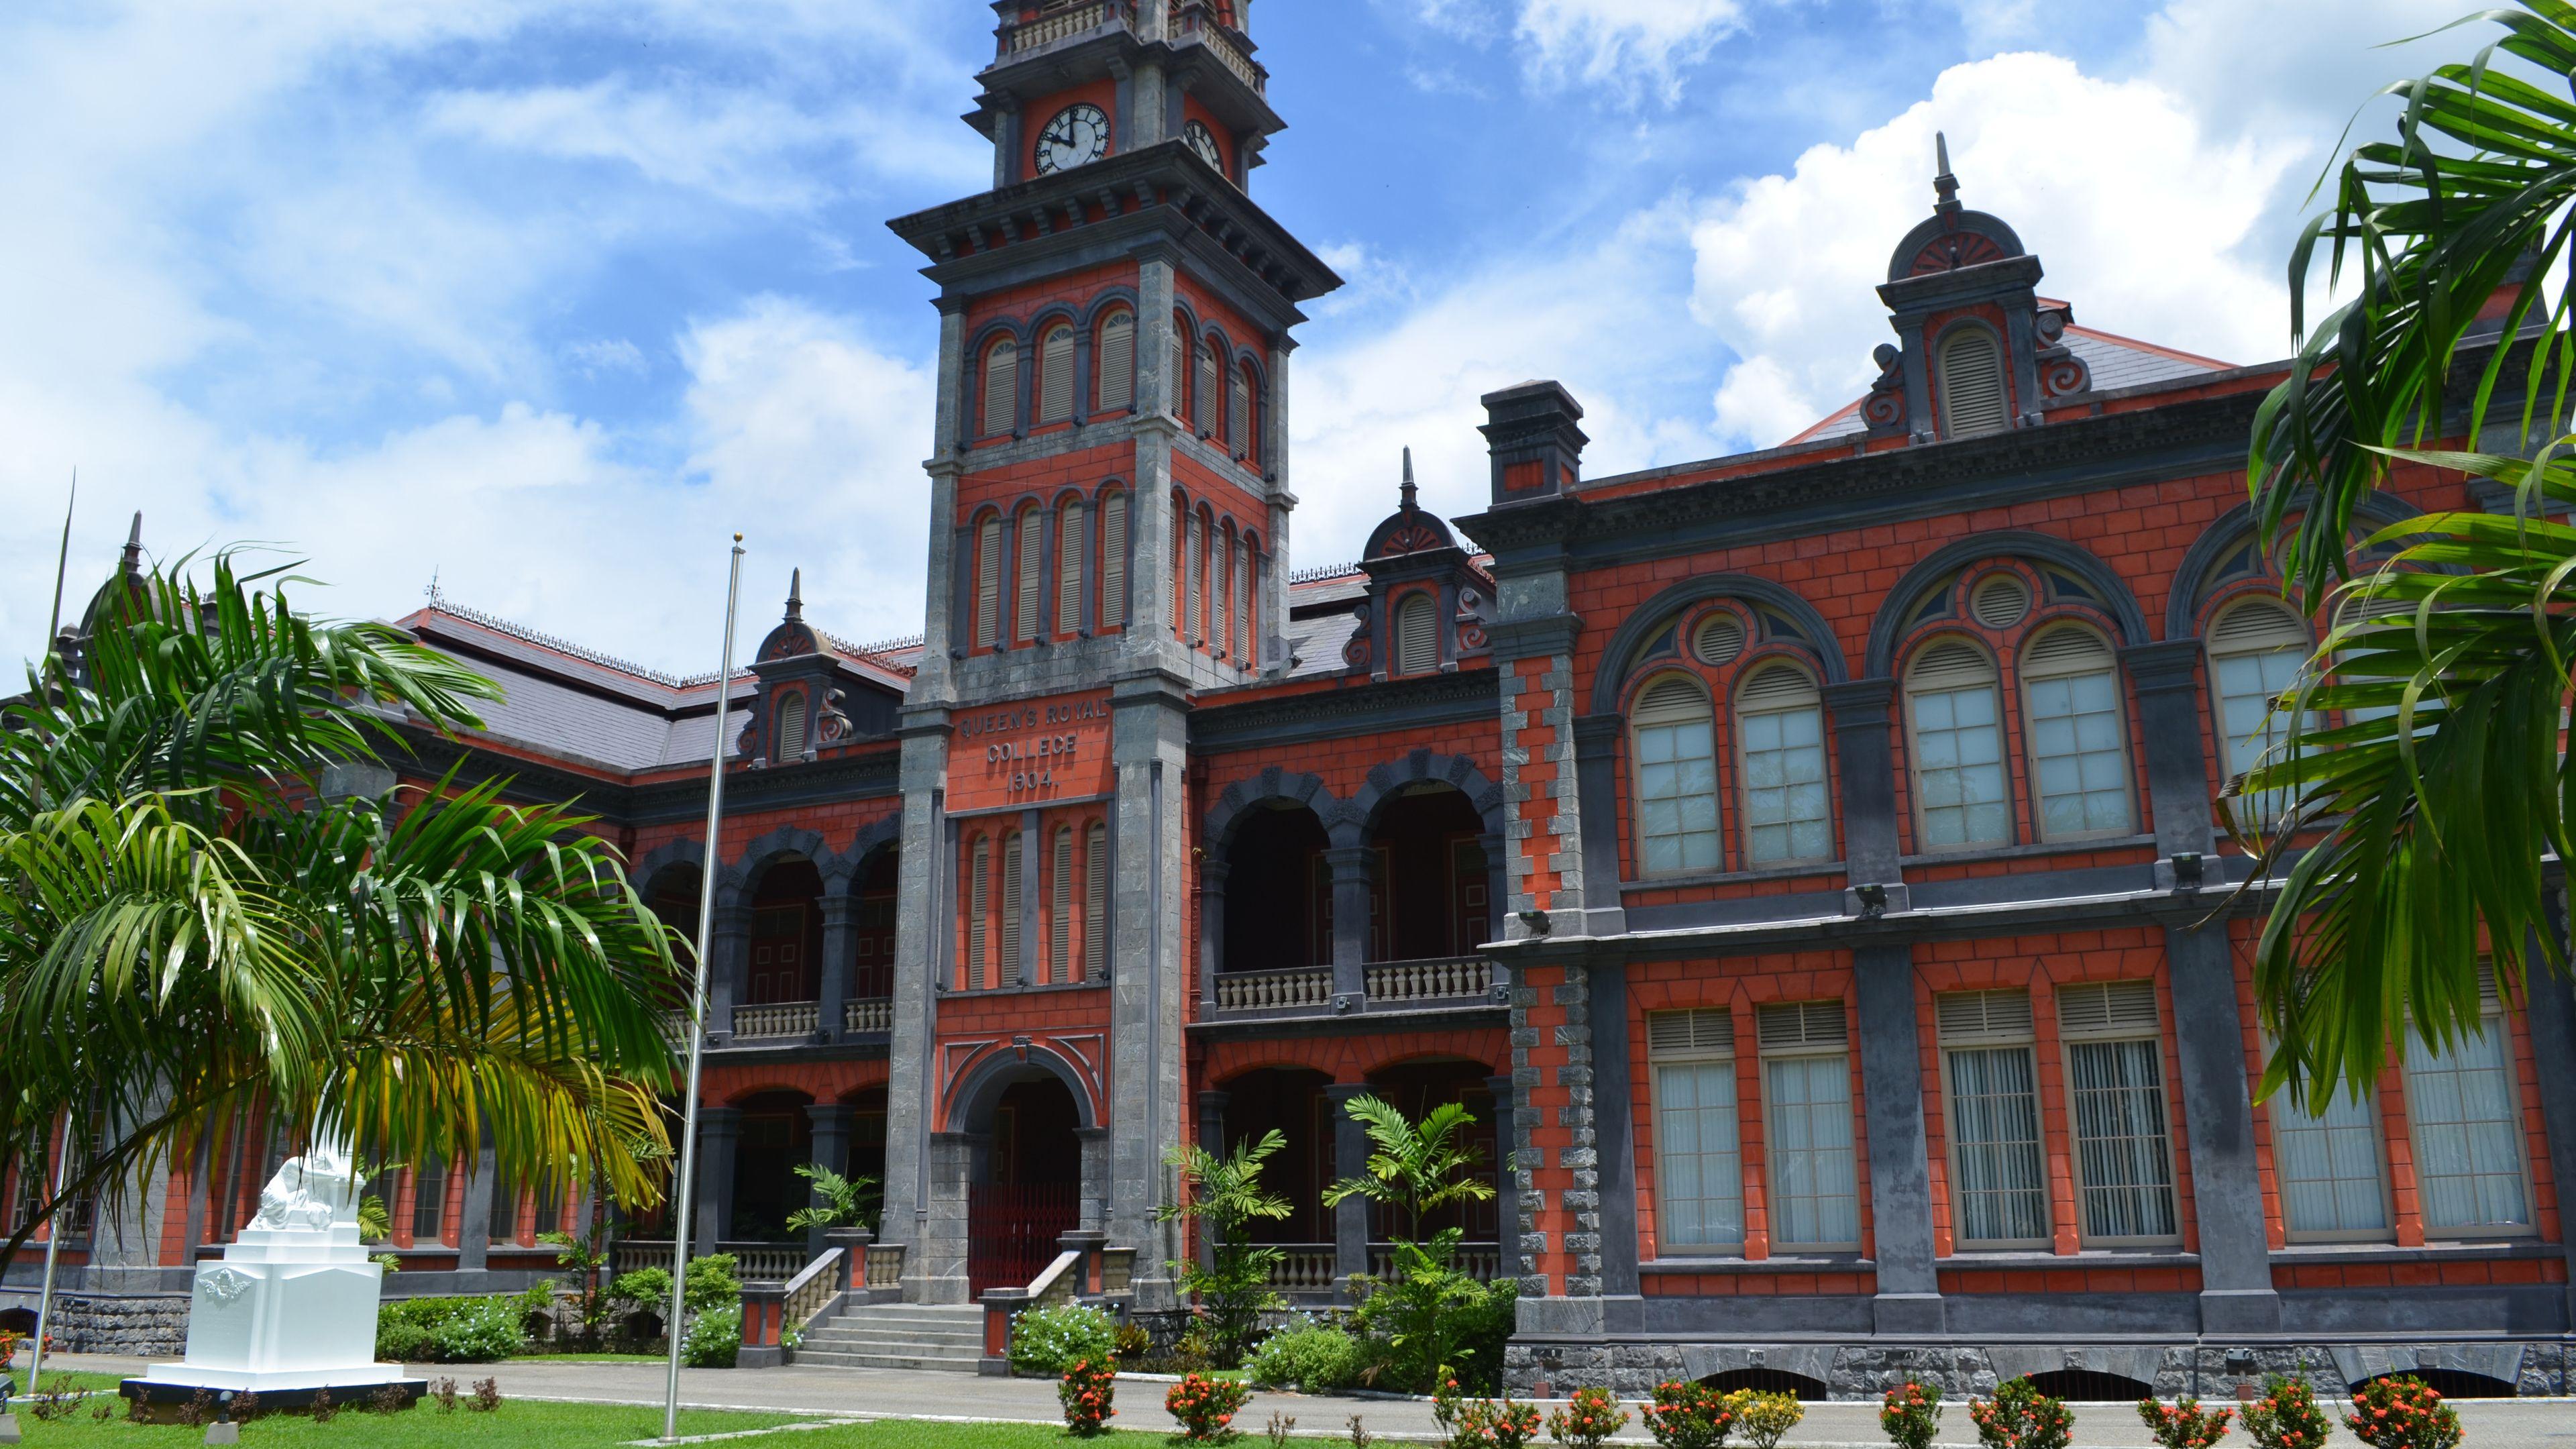 Historical building found on Trinidad